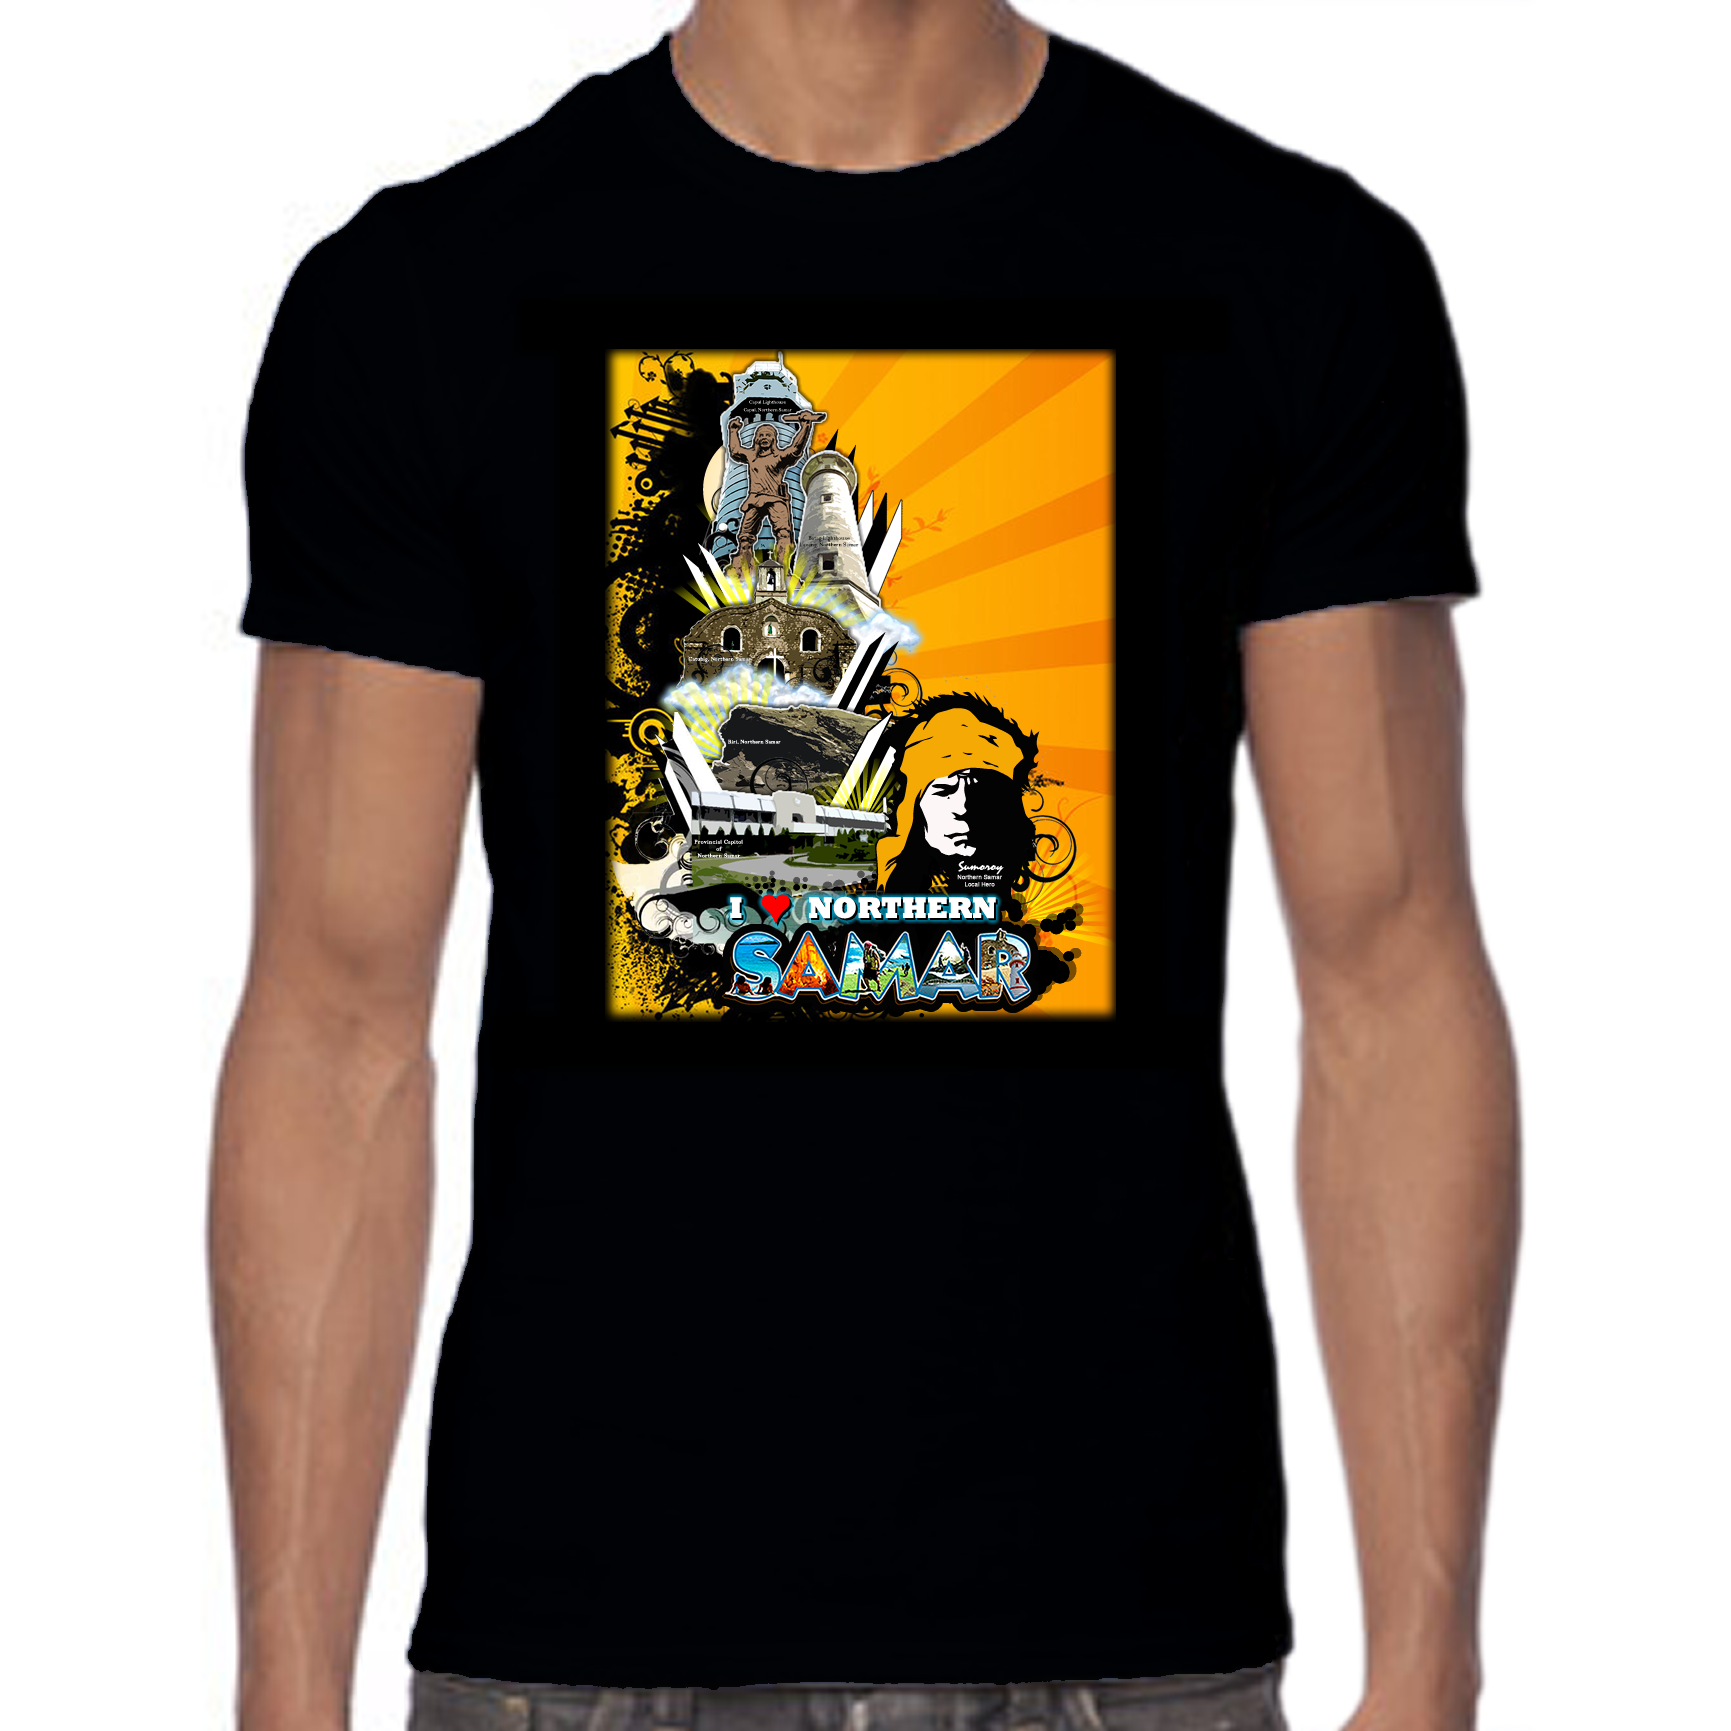 https://kustomays.com/wp-content/uploads/2013/05/Northern-Samar-Black-Tshirt.png